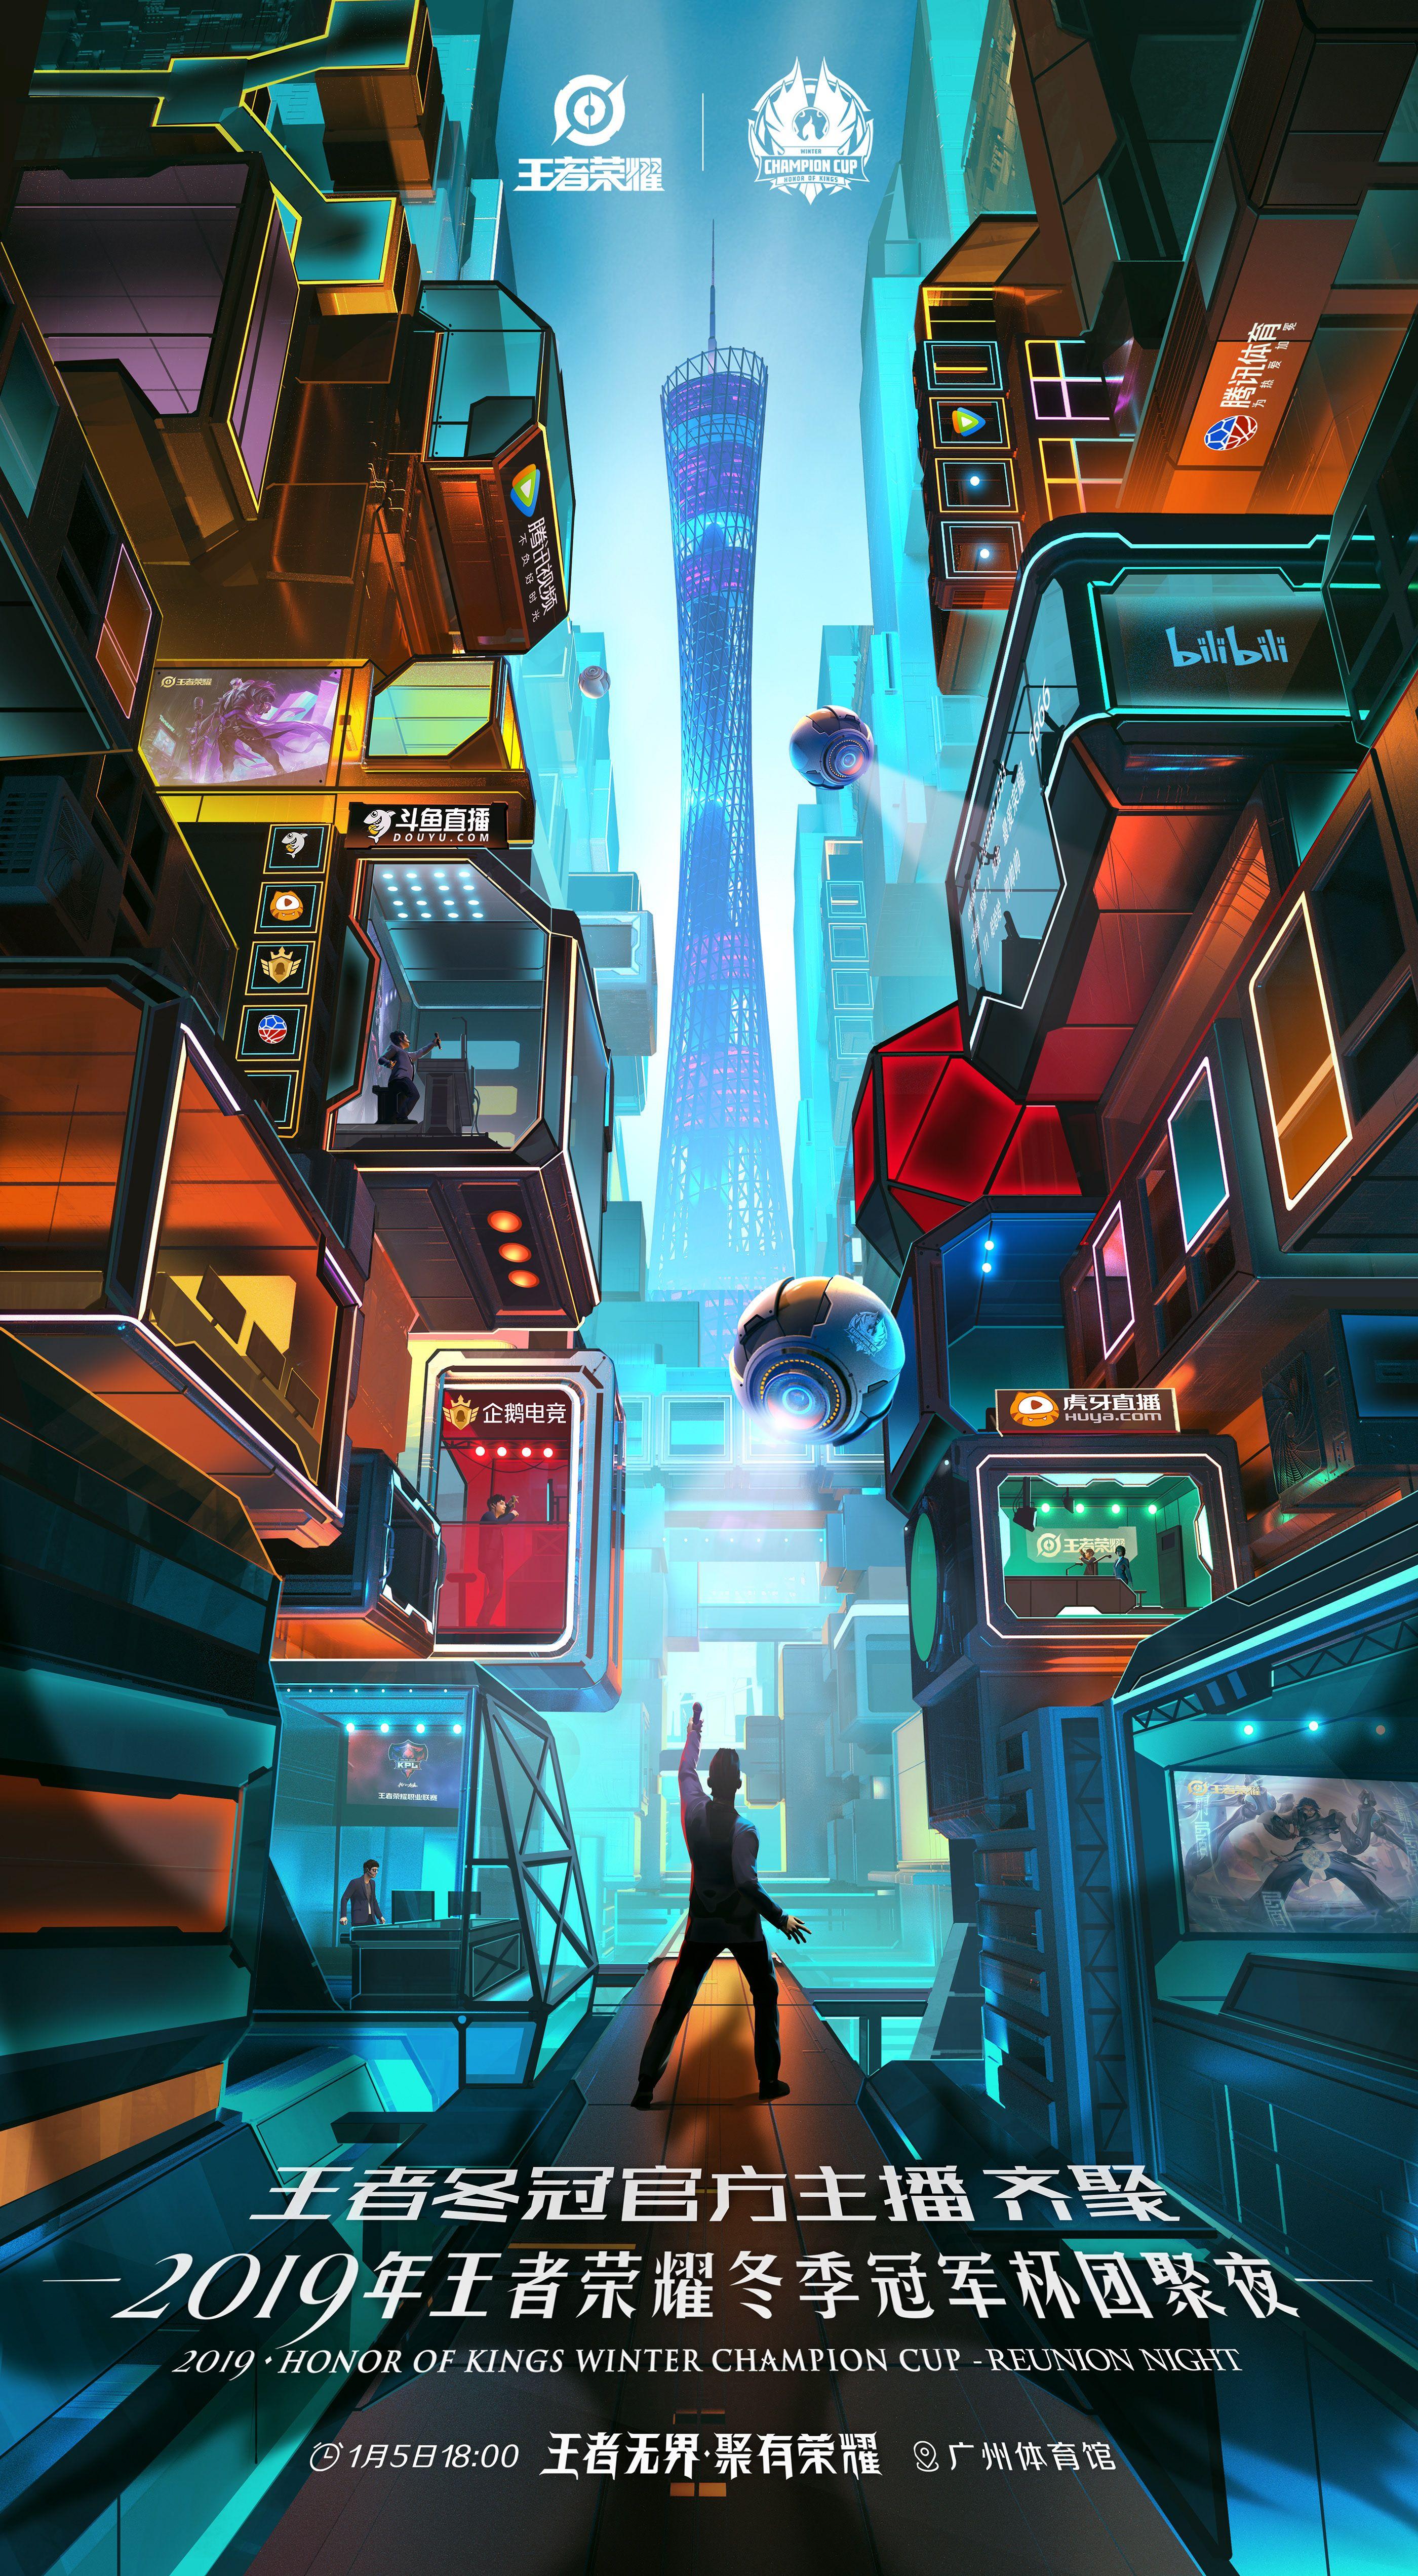 Behance 图形设计 on Behance in 2020 Digital artwork